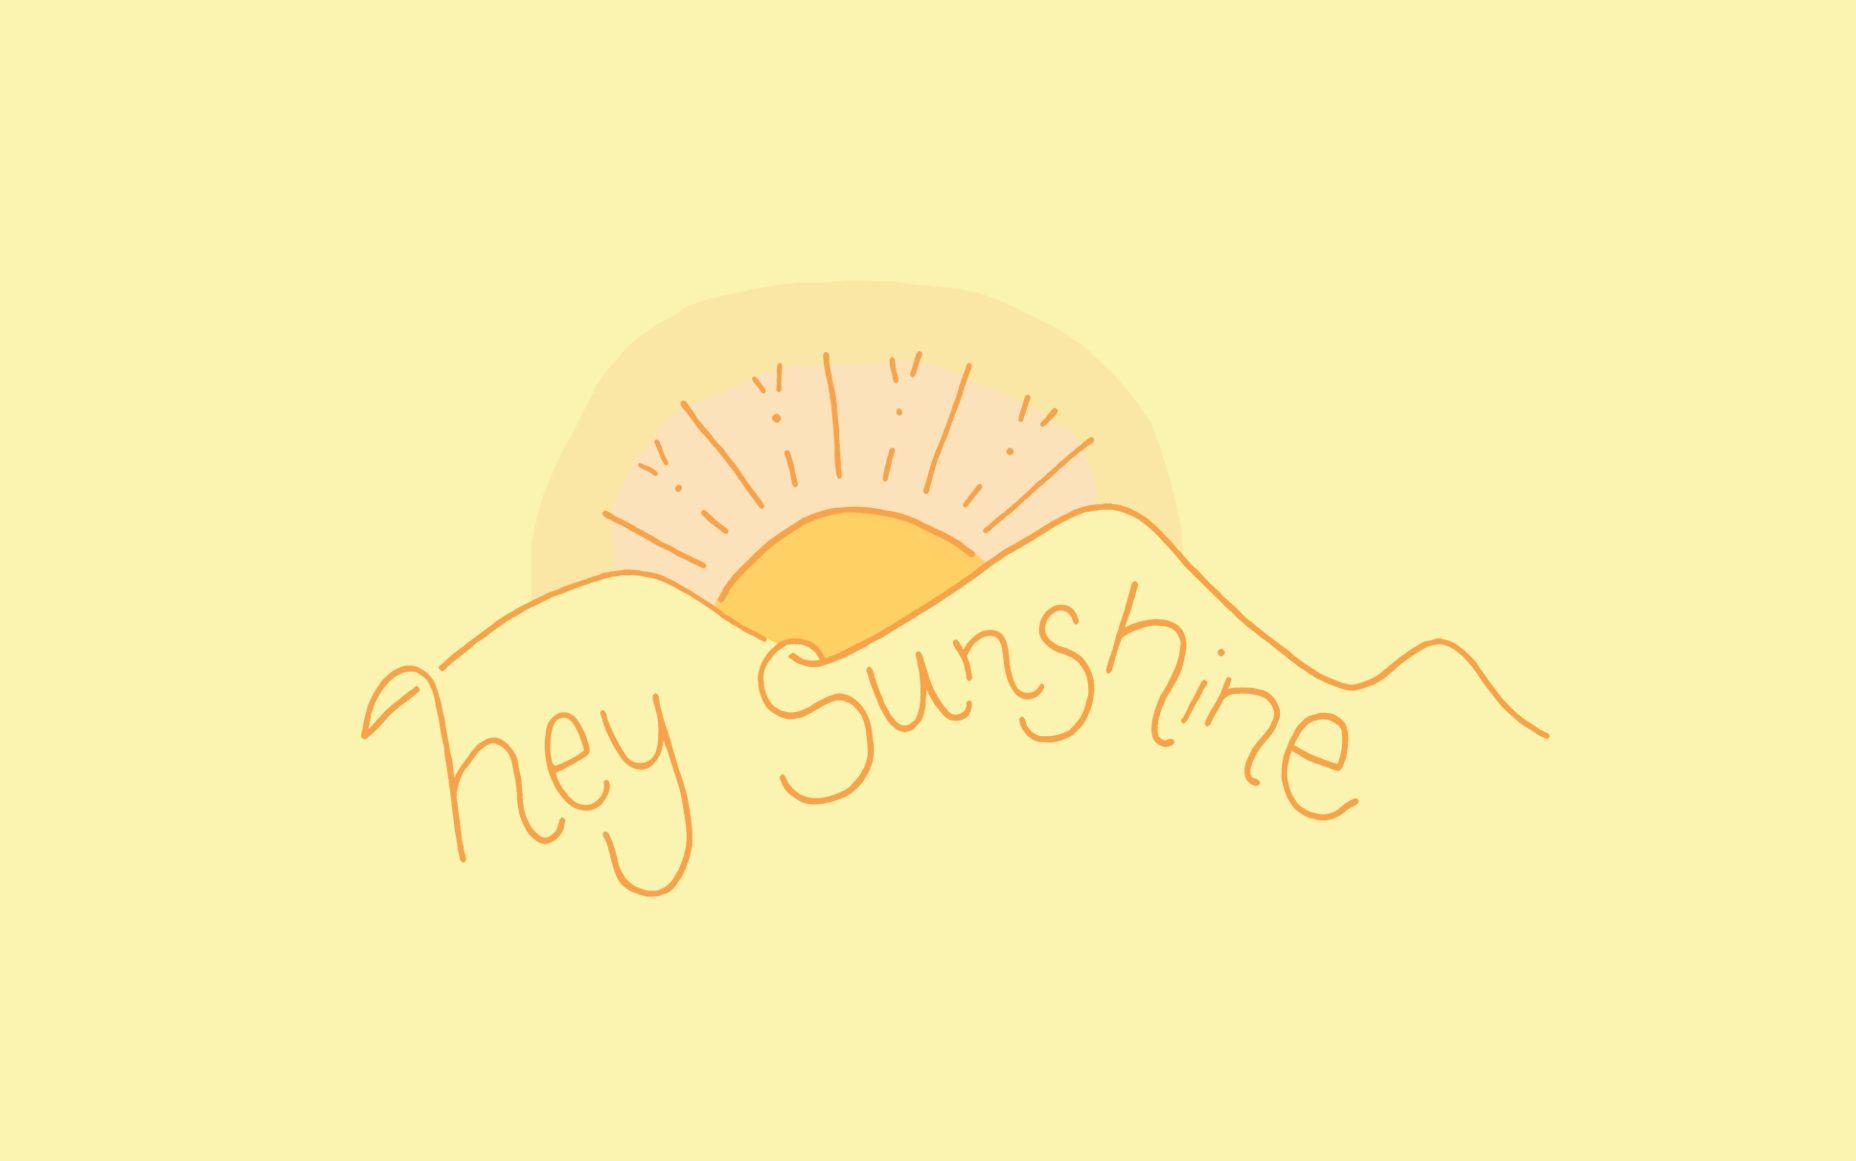 hey sunshine | Cute desktop wallpaper, Cute laptop ...